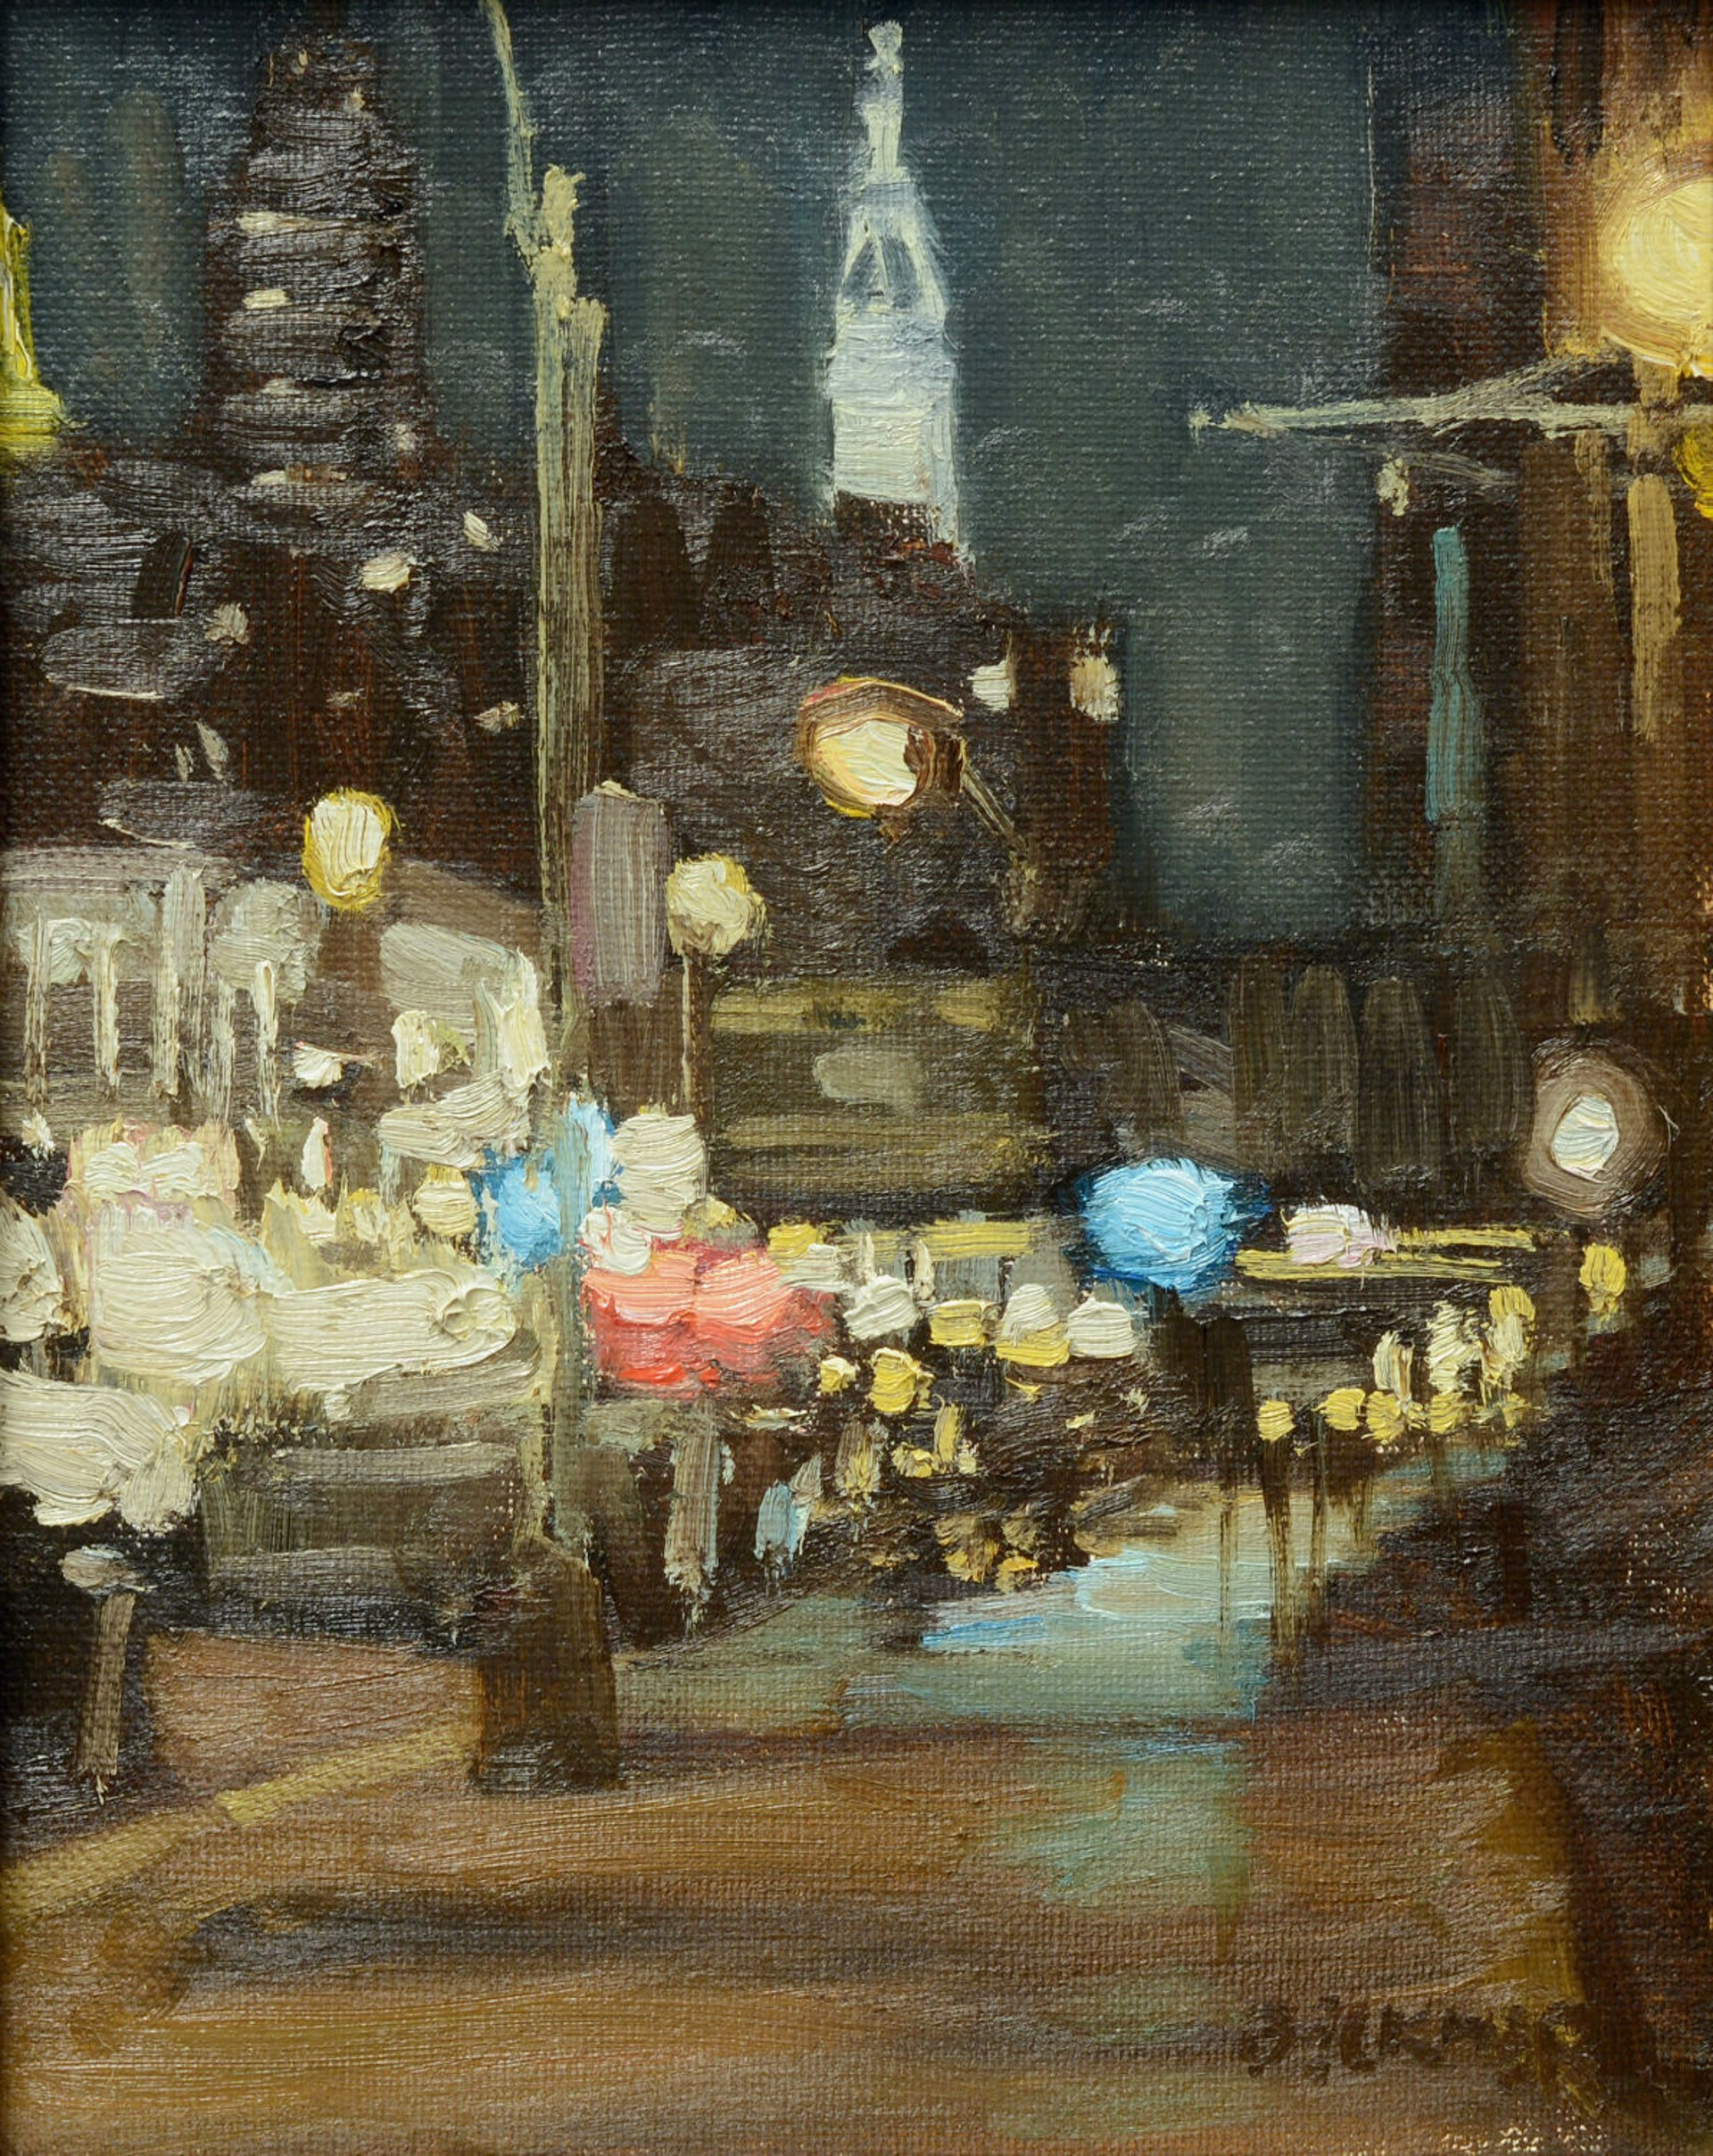 Street Lights by Jim Beckner